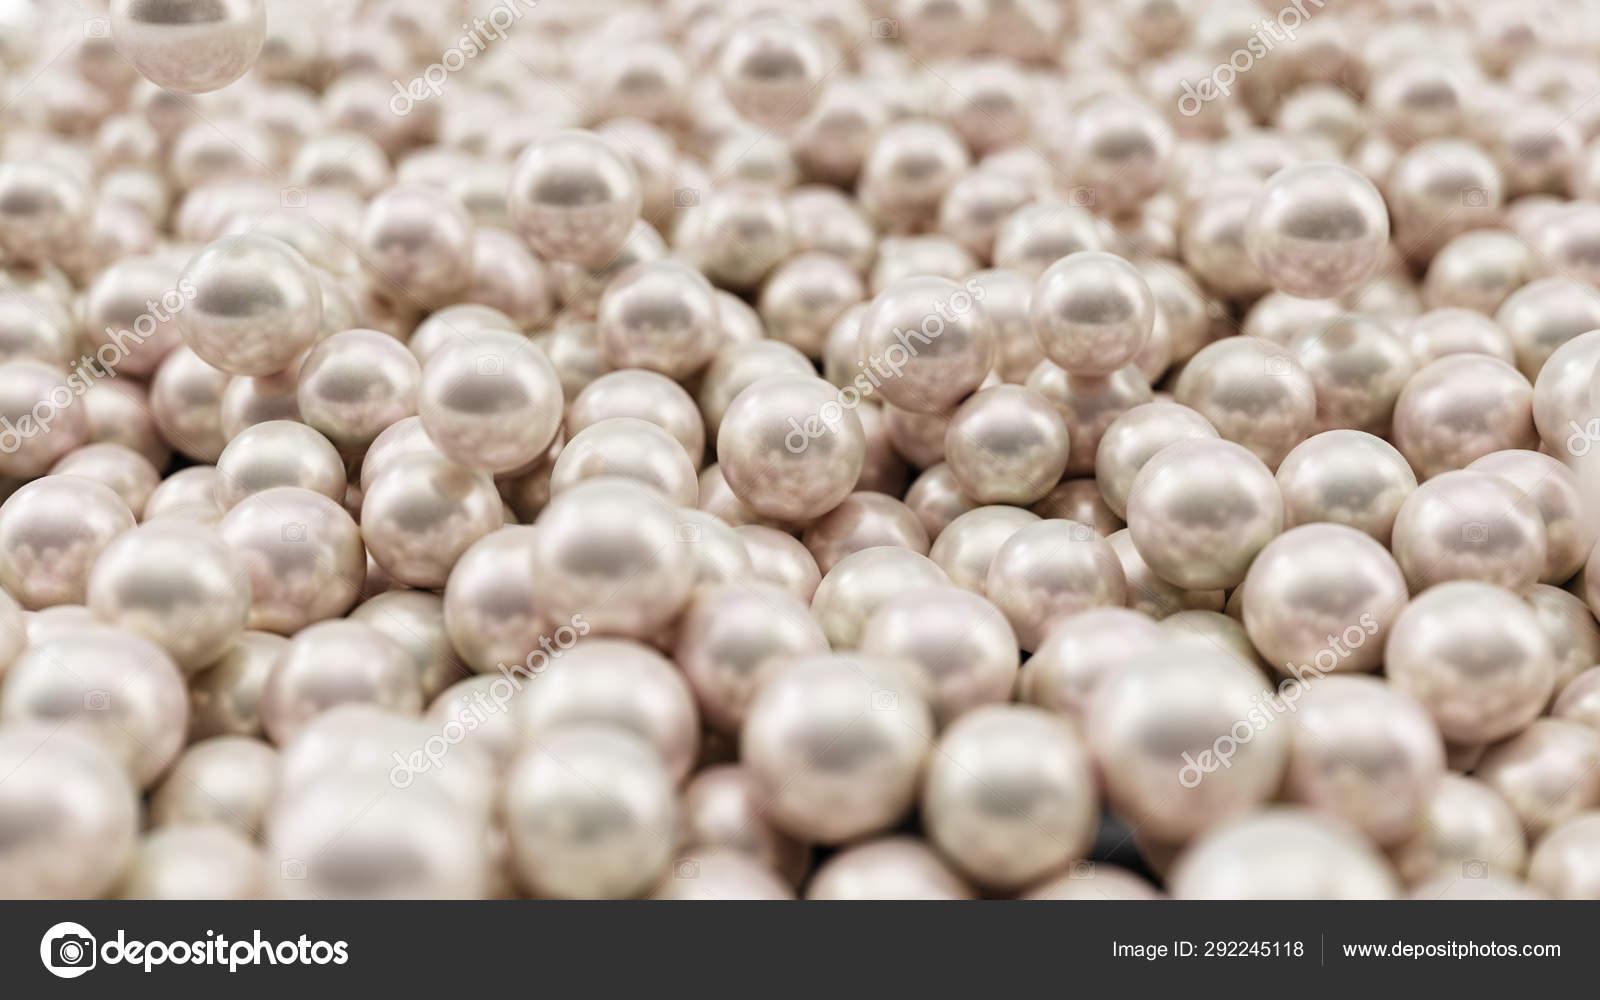 Piles of Pearls!